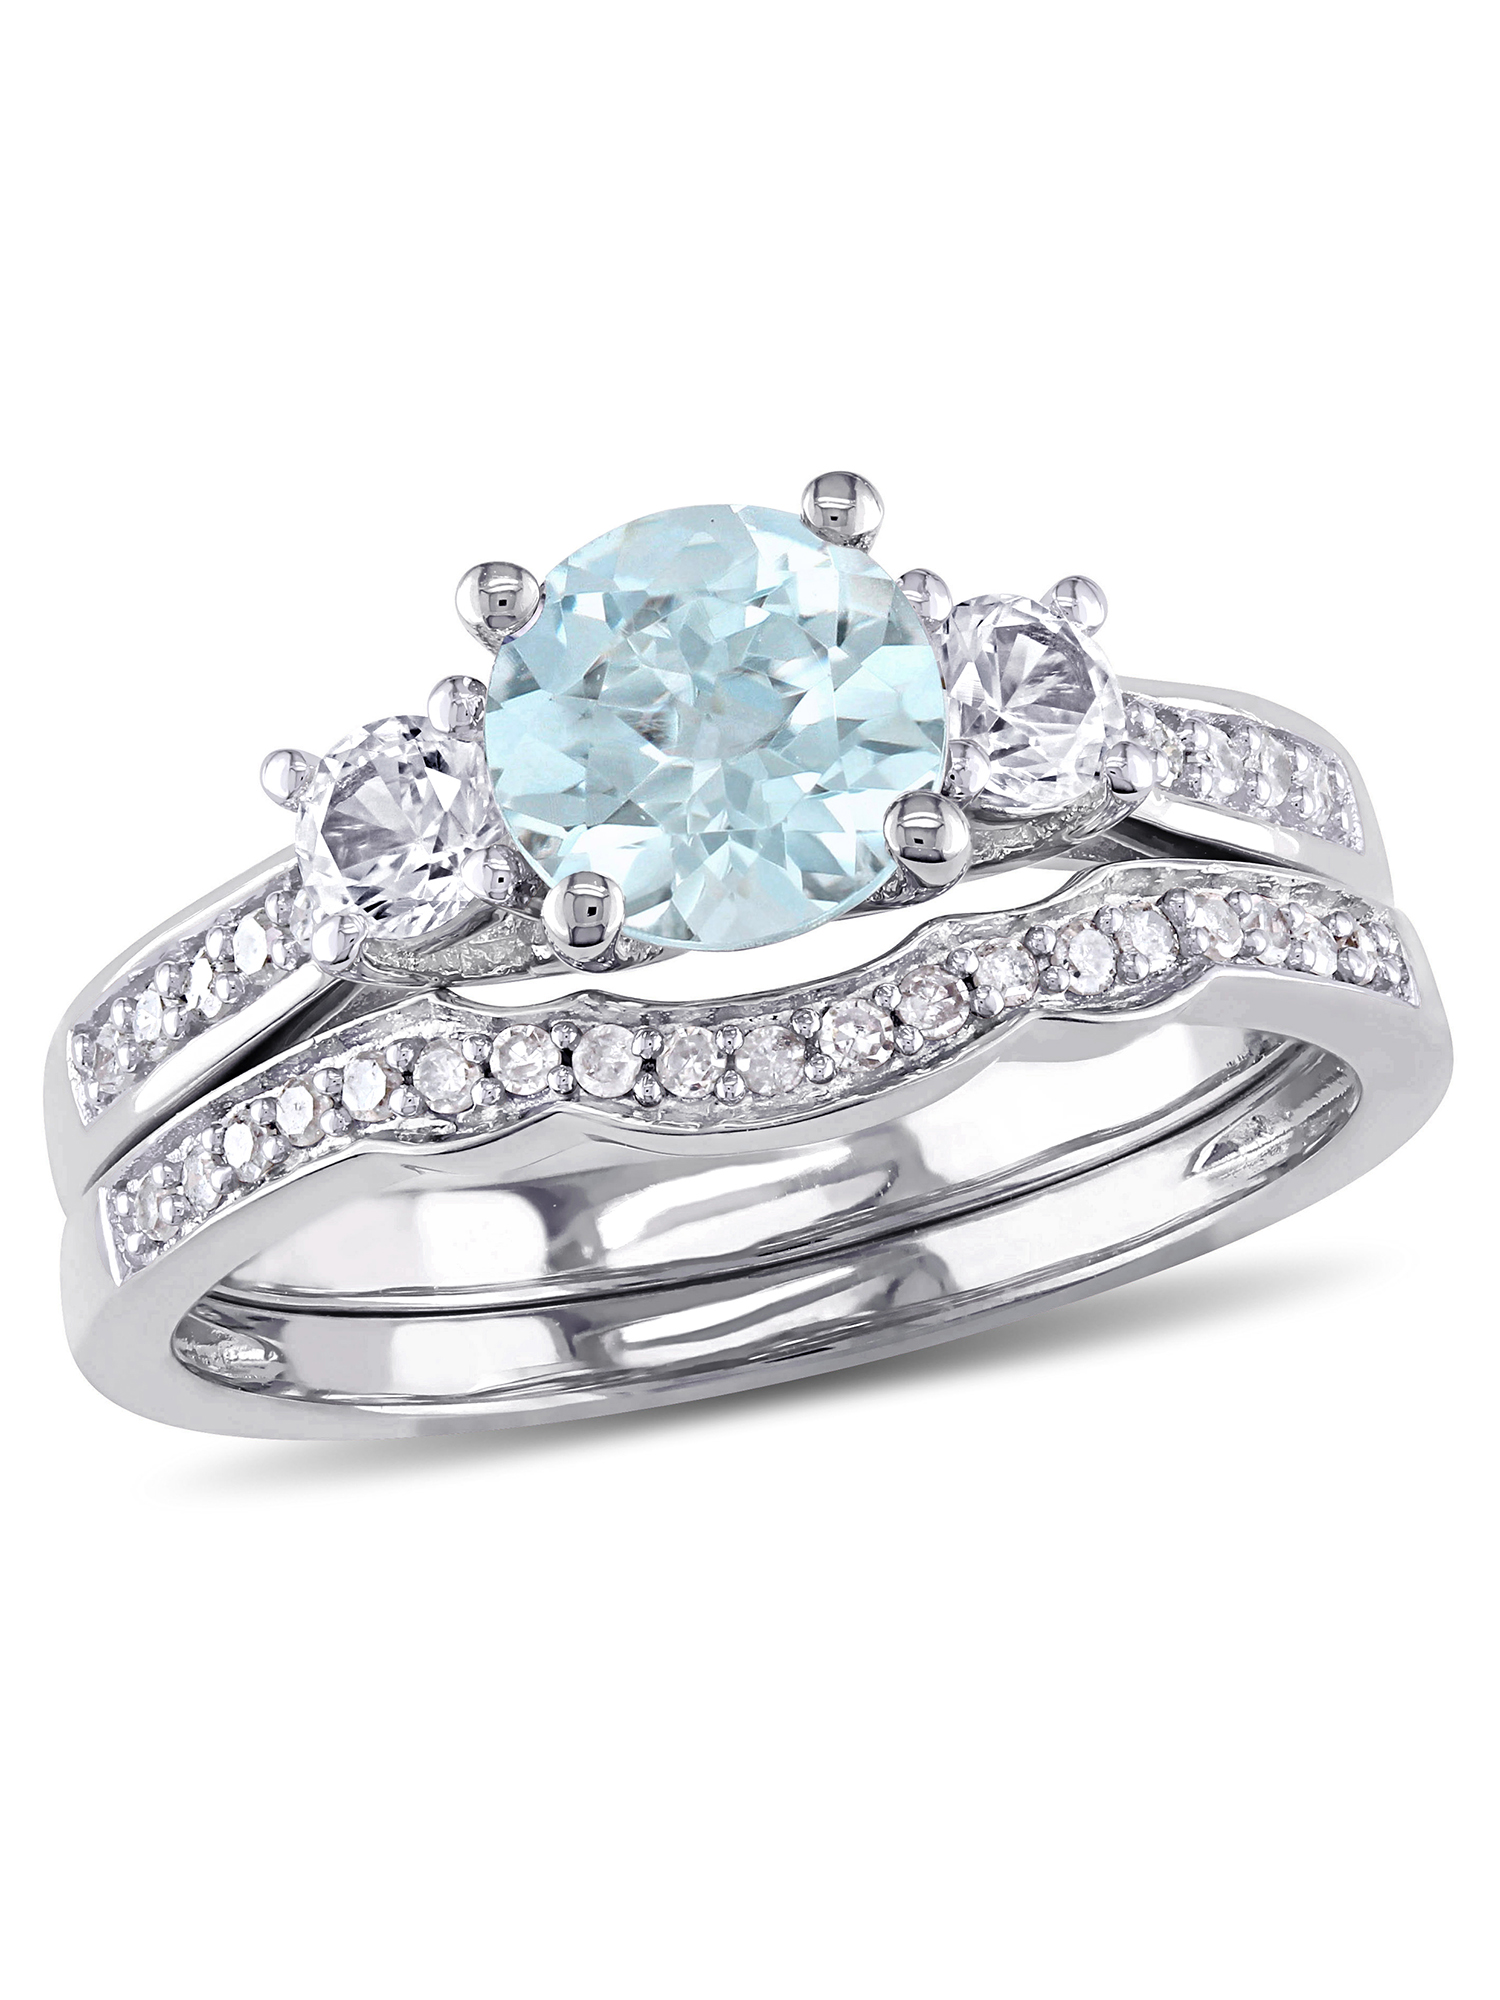 1 Carat T.G.W. Aquamarine and Created White Sapphire and 1/7 Carat T.W. Diamond 10kt White Gold Bridal Set